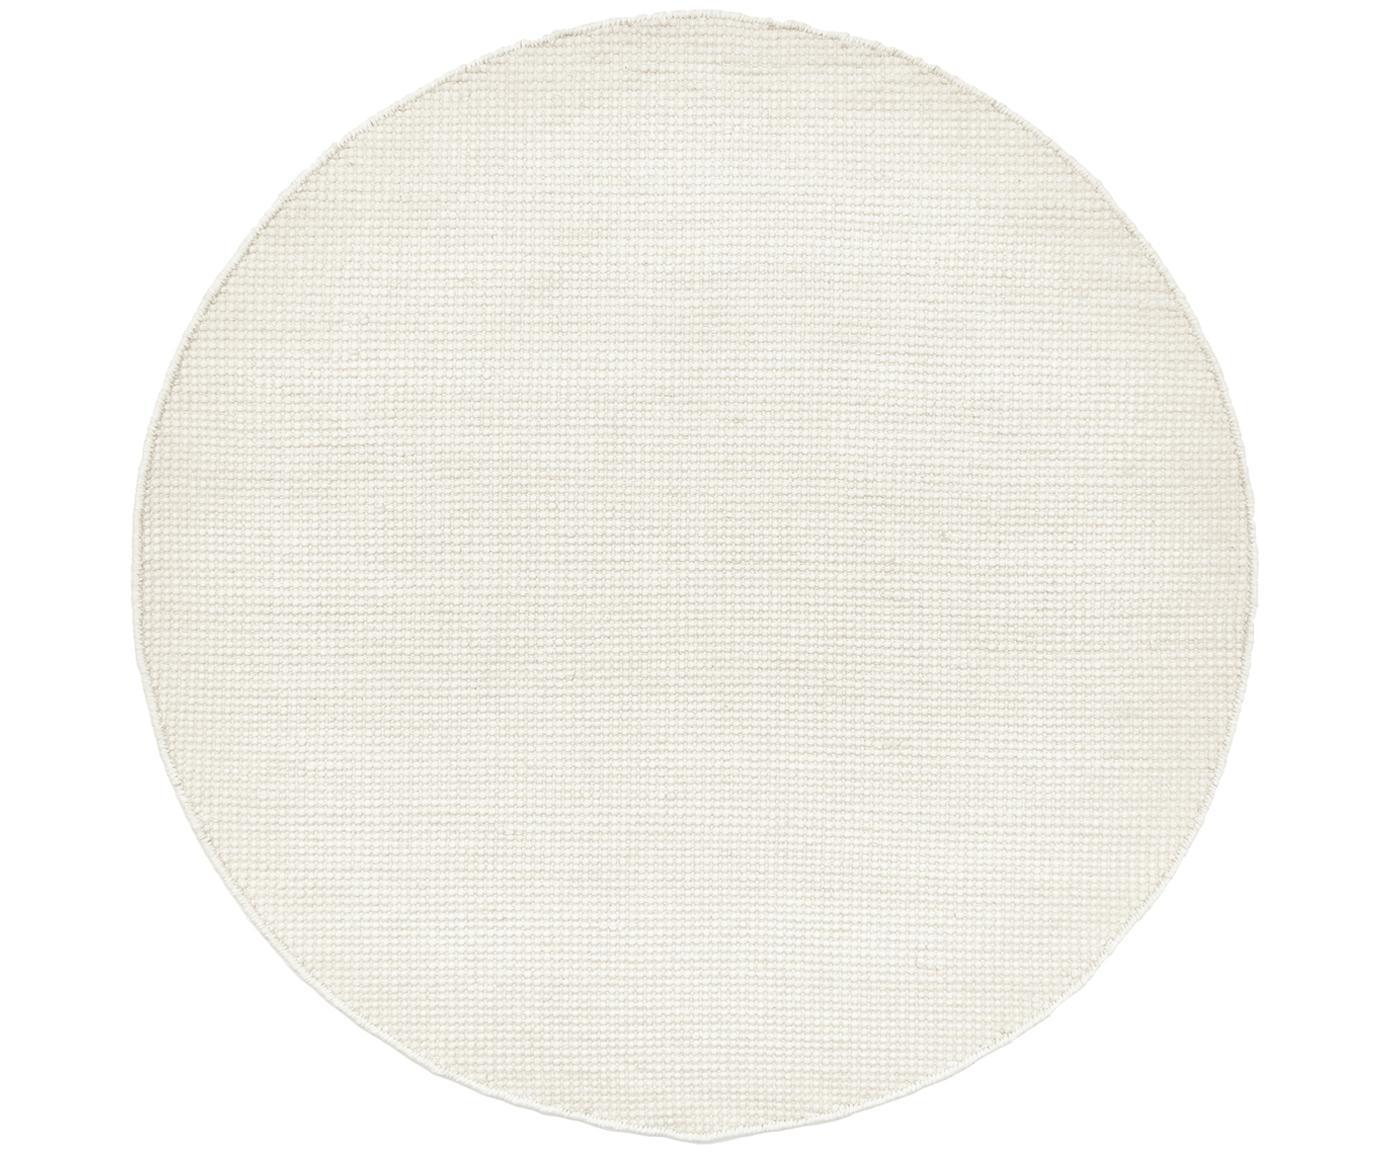 Alfombra de lana tejida a mano Amaro, 38%lana, 22%poliéster, 20%algodón, 20%poliamida, Blanco crema, Ø 140 cm (Tamaño M)